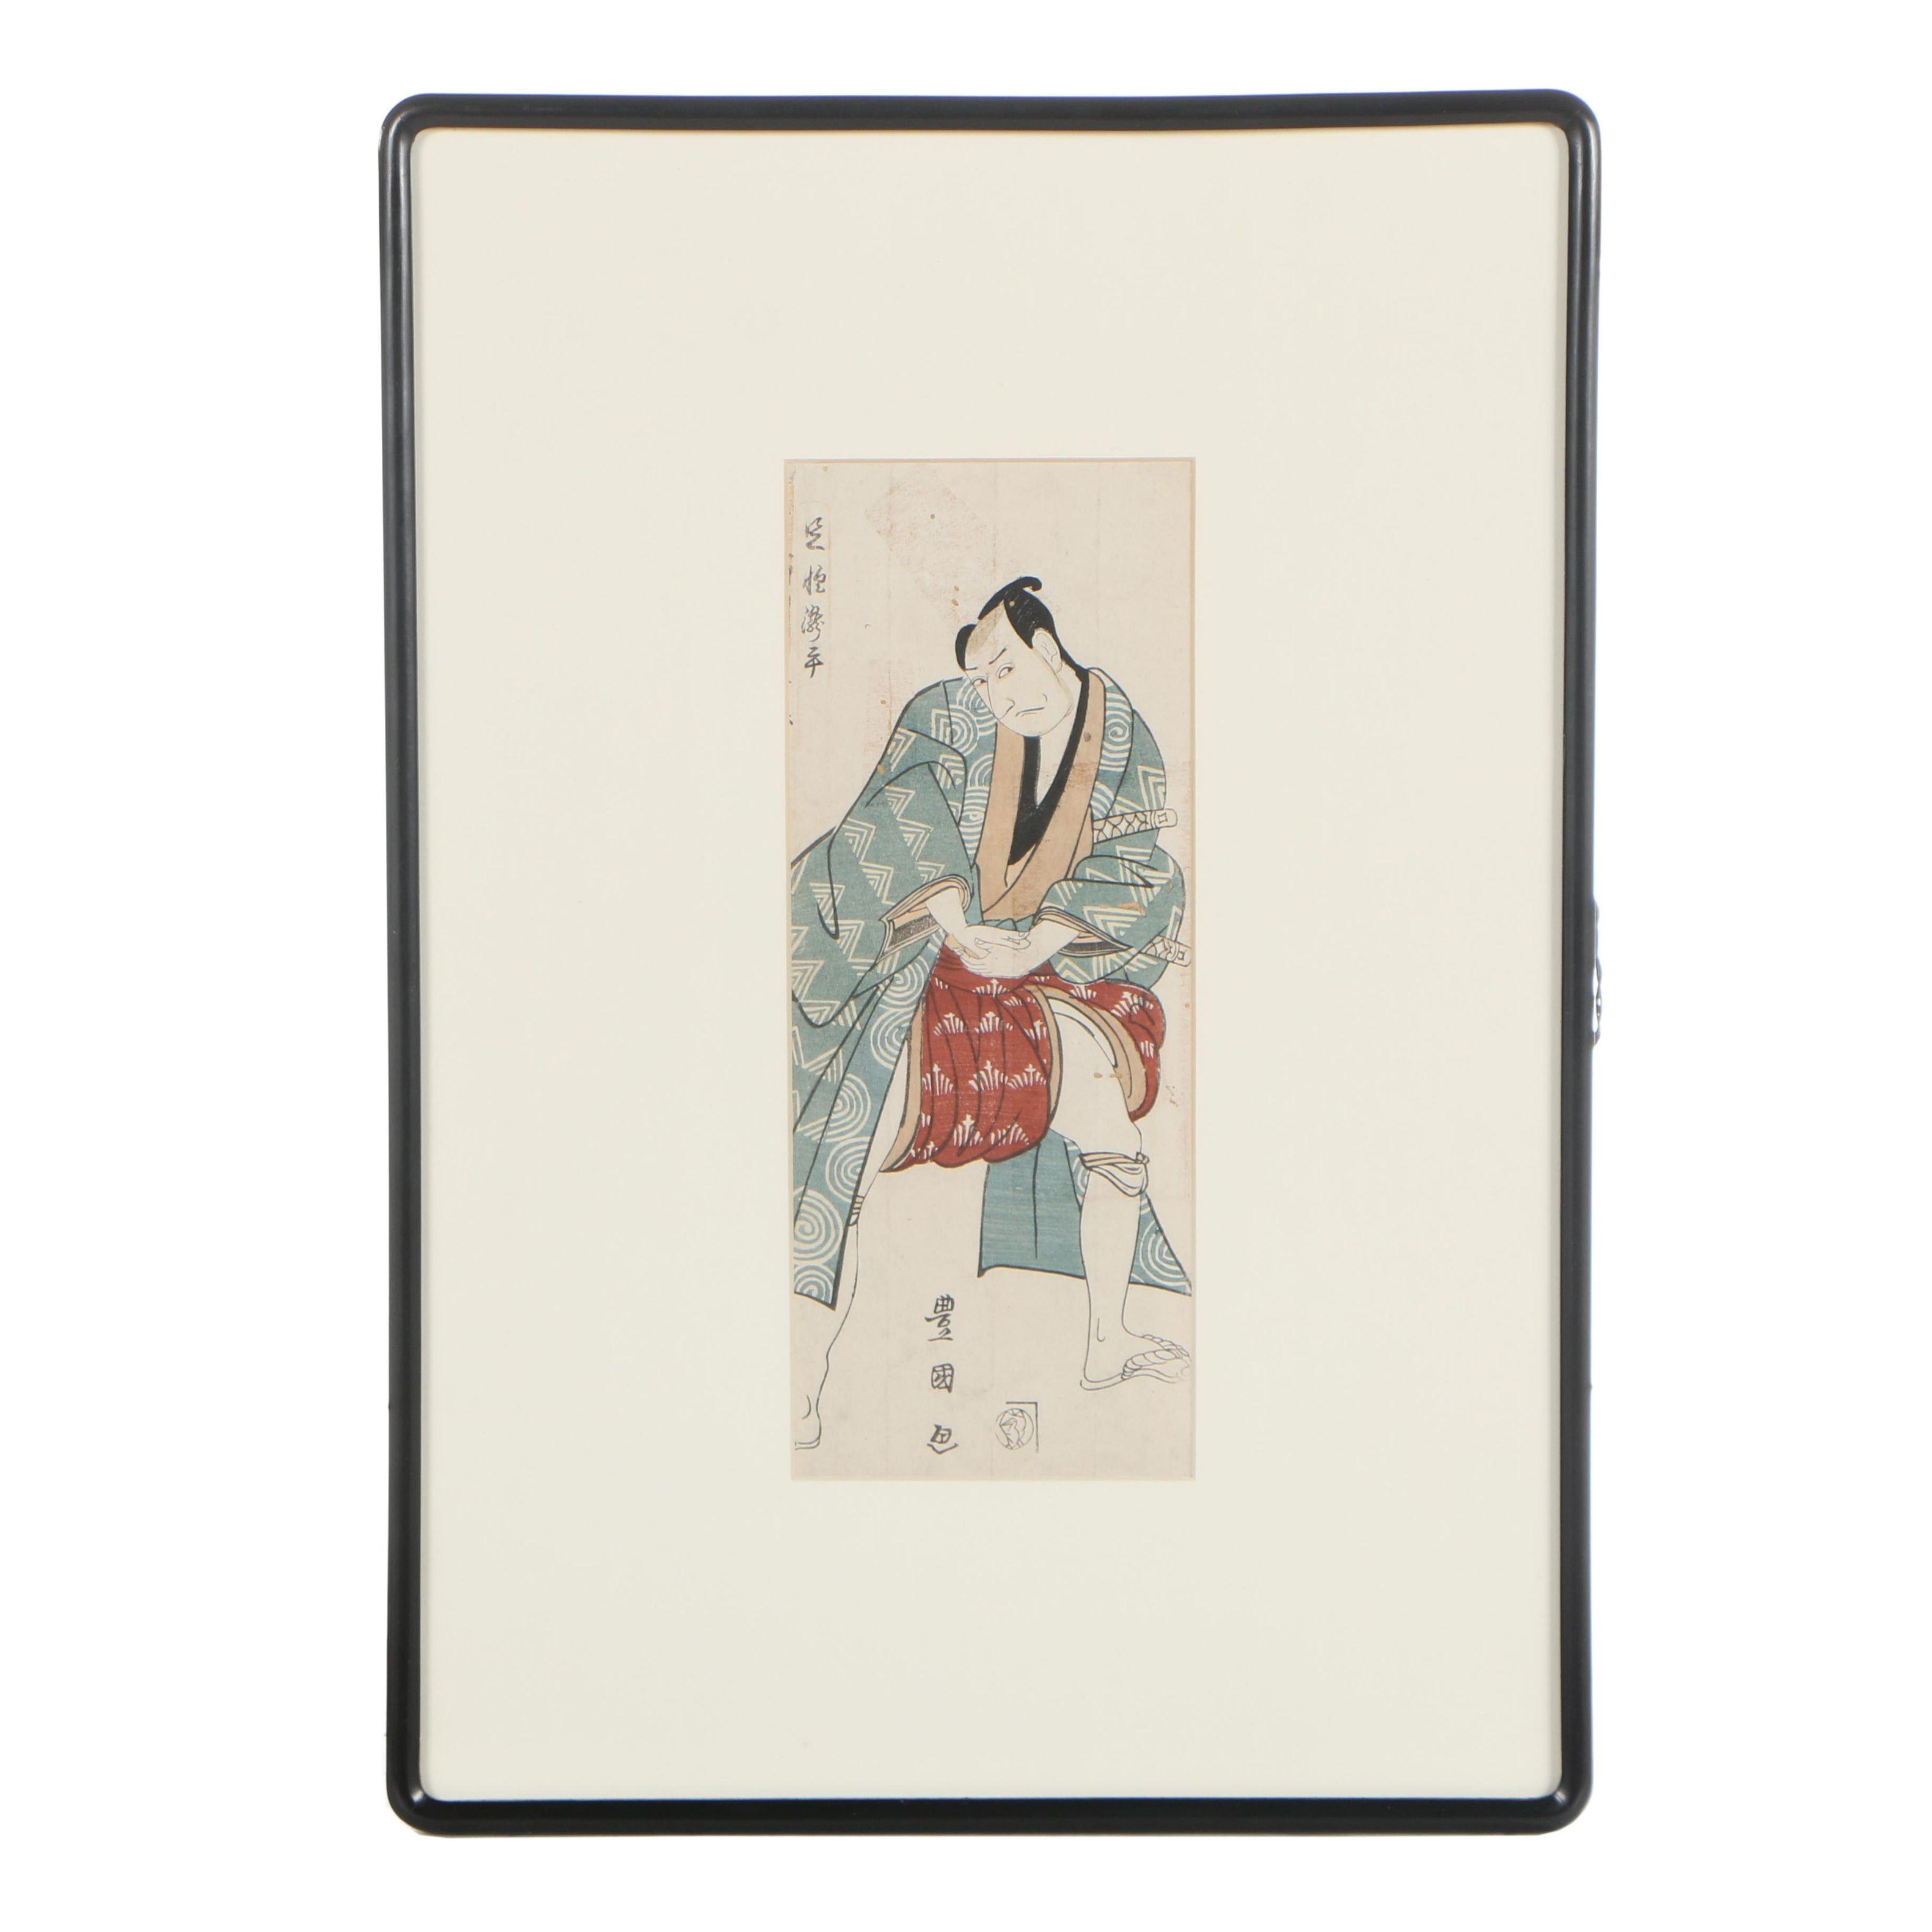 Utagawa Toyokuni Woodblock Print of Ichikawa Omezō